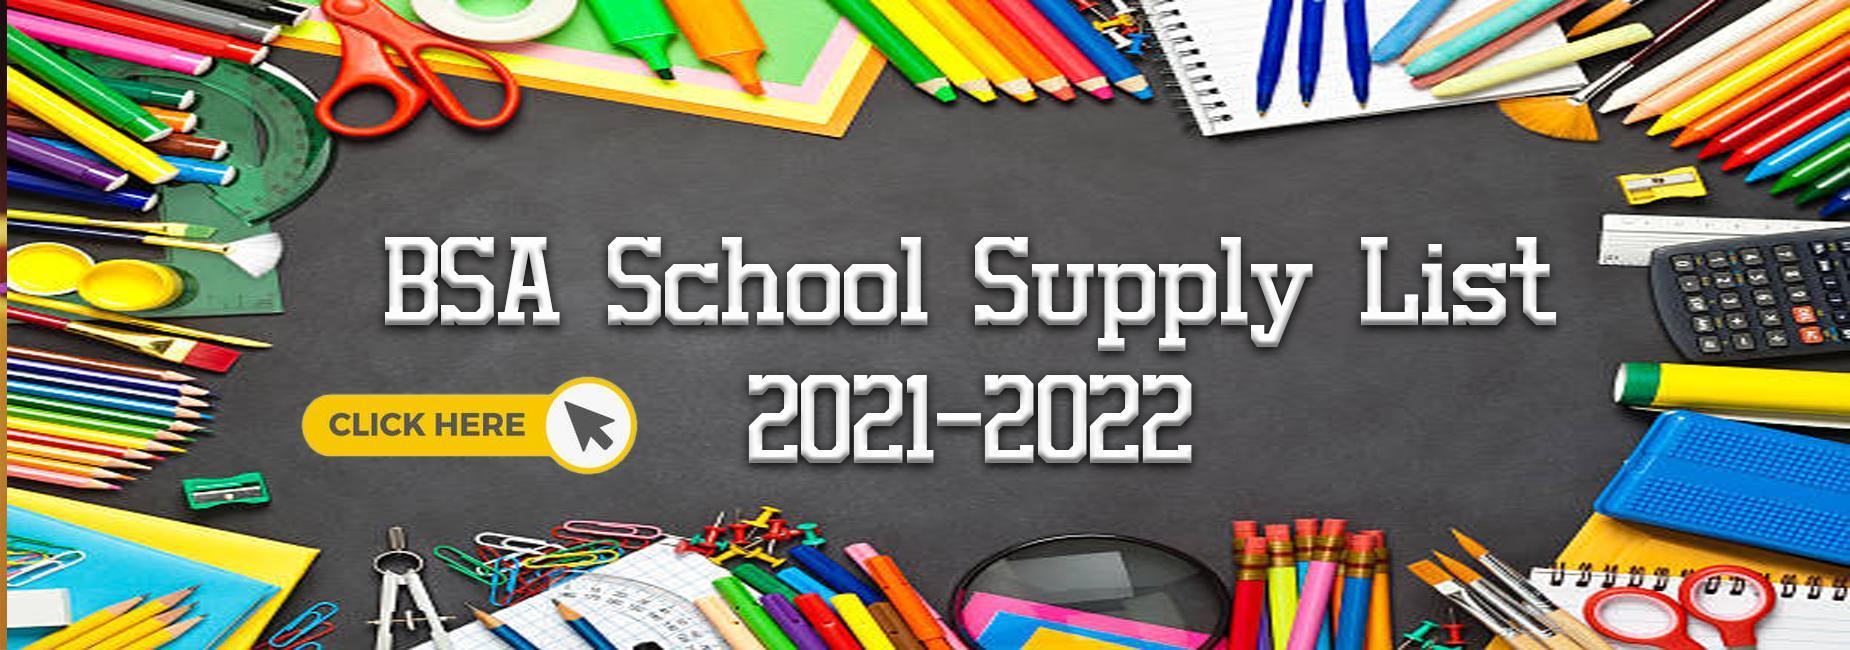 2021-2022 School Supply List Click Here